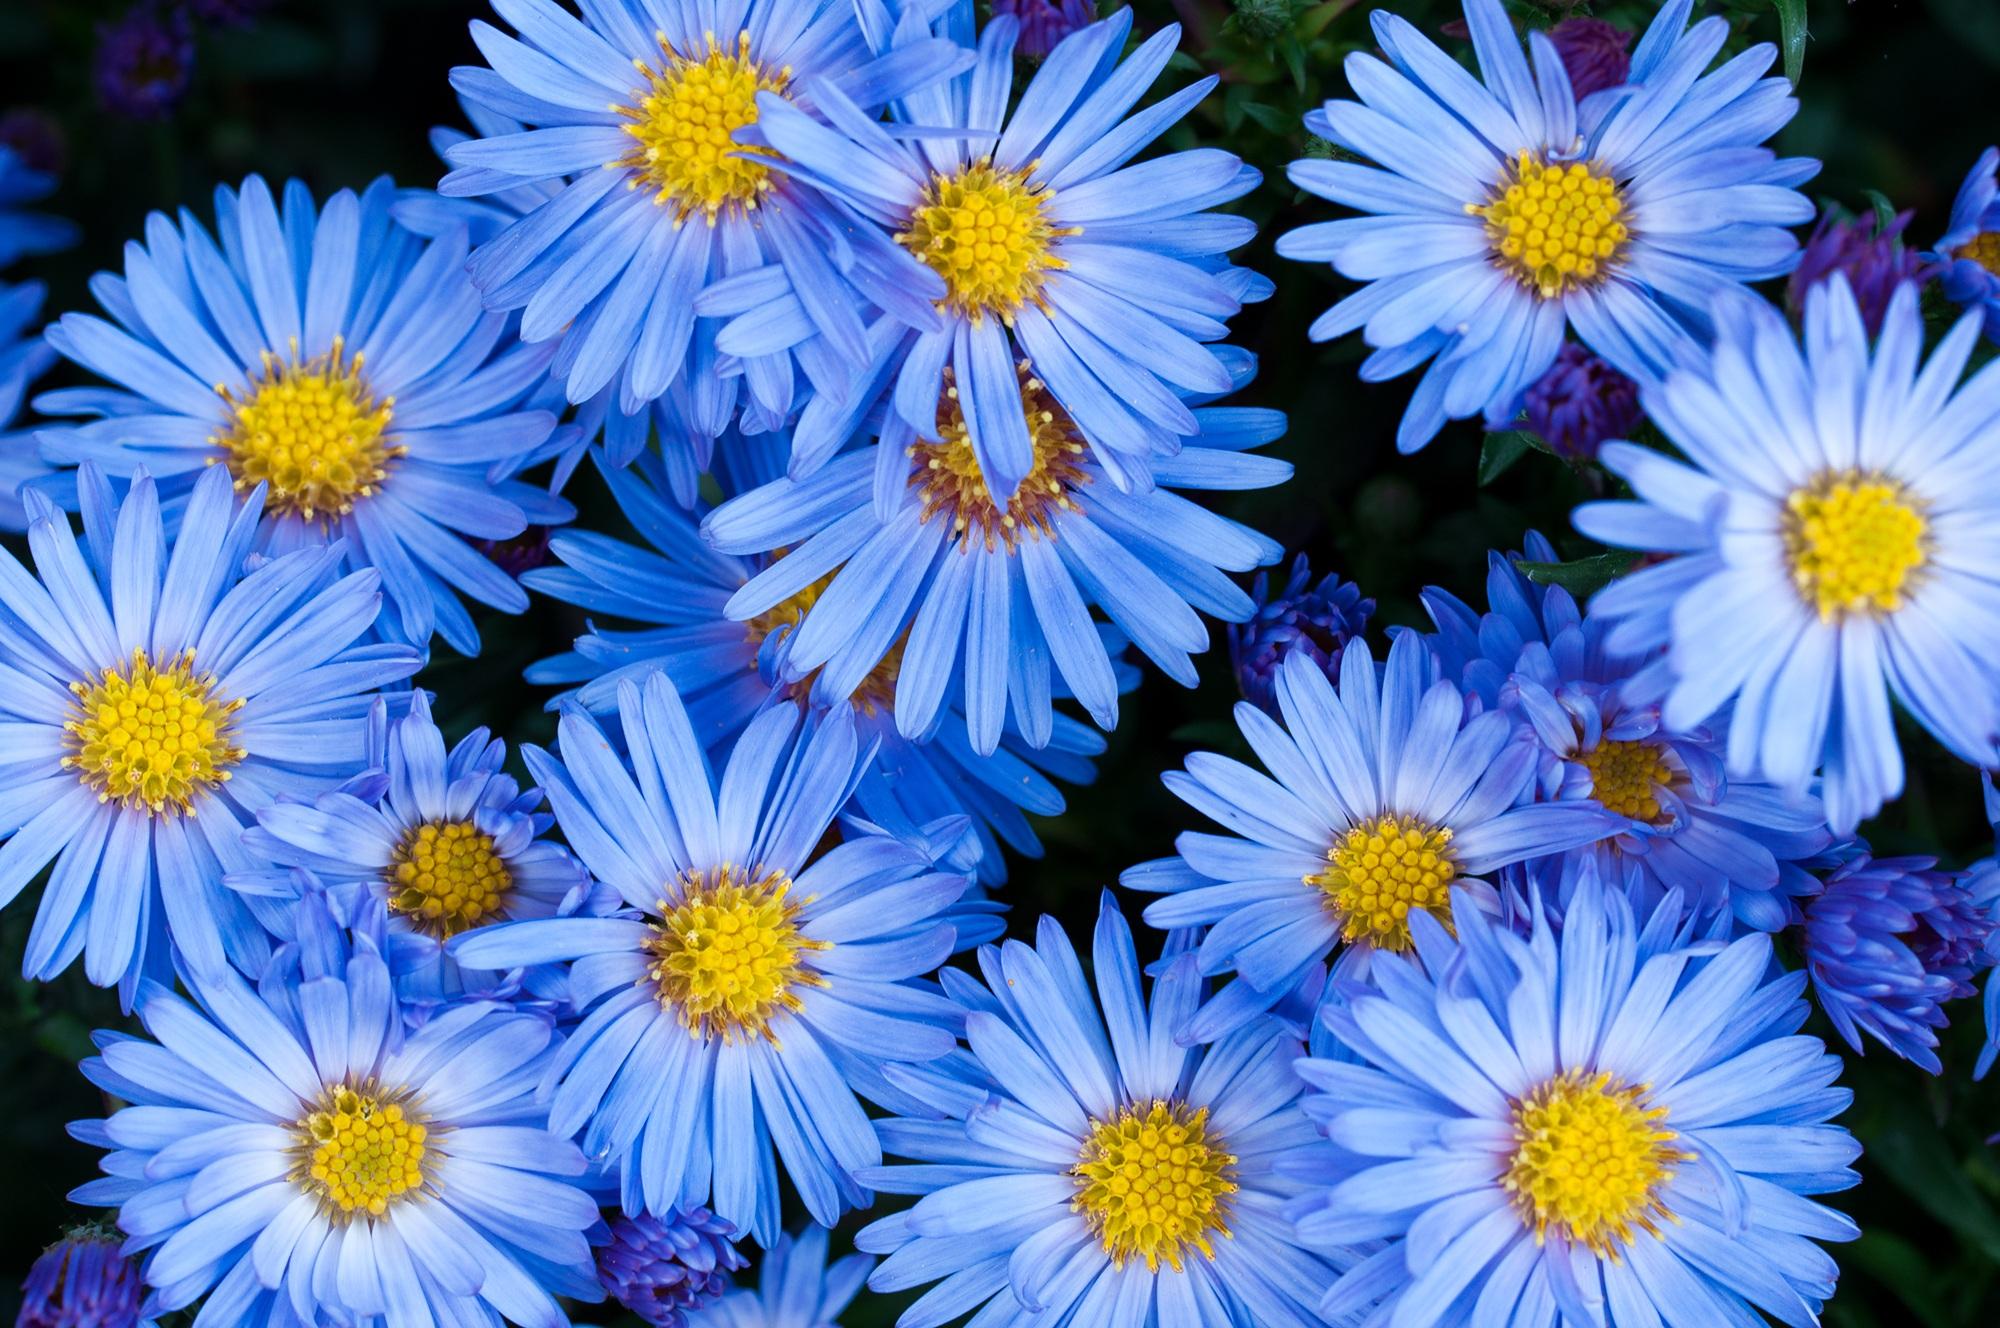 Free Images Petal Flora Blue Flower Aster Flower Garden